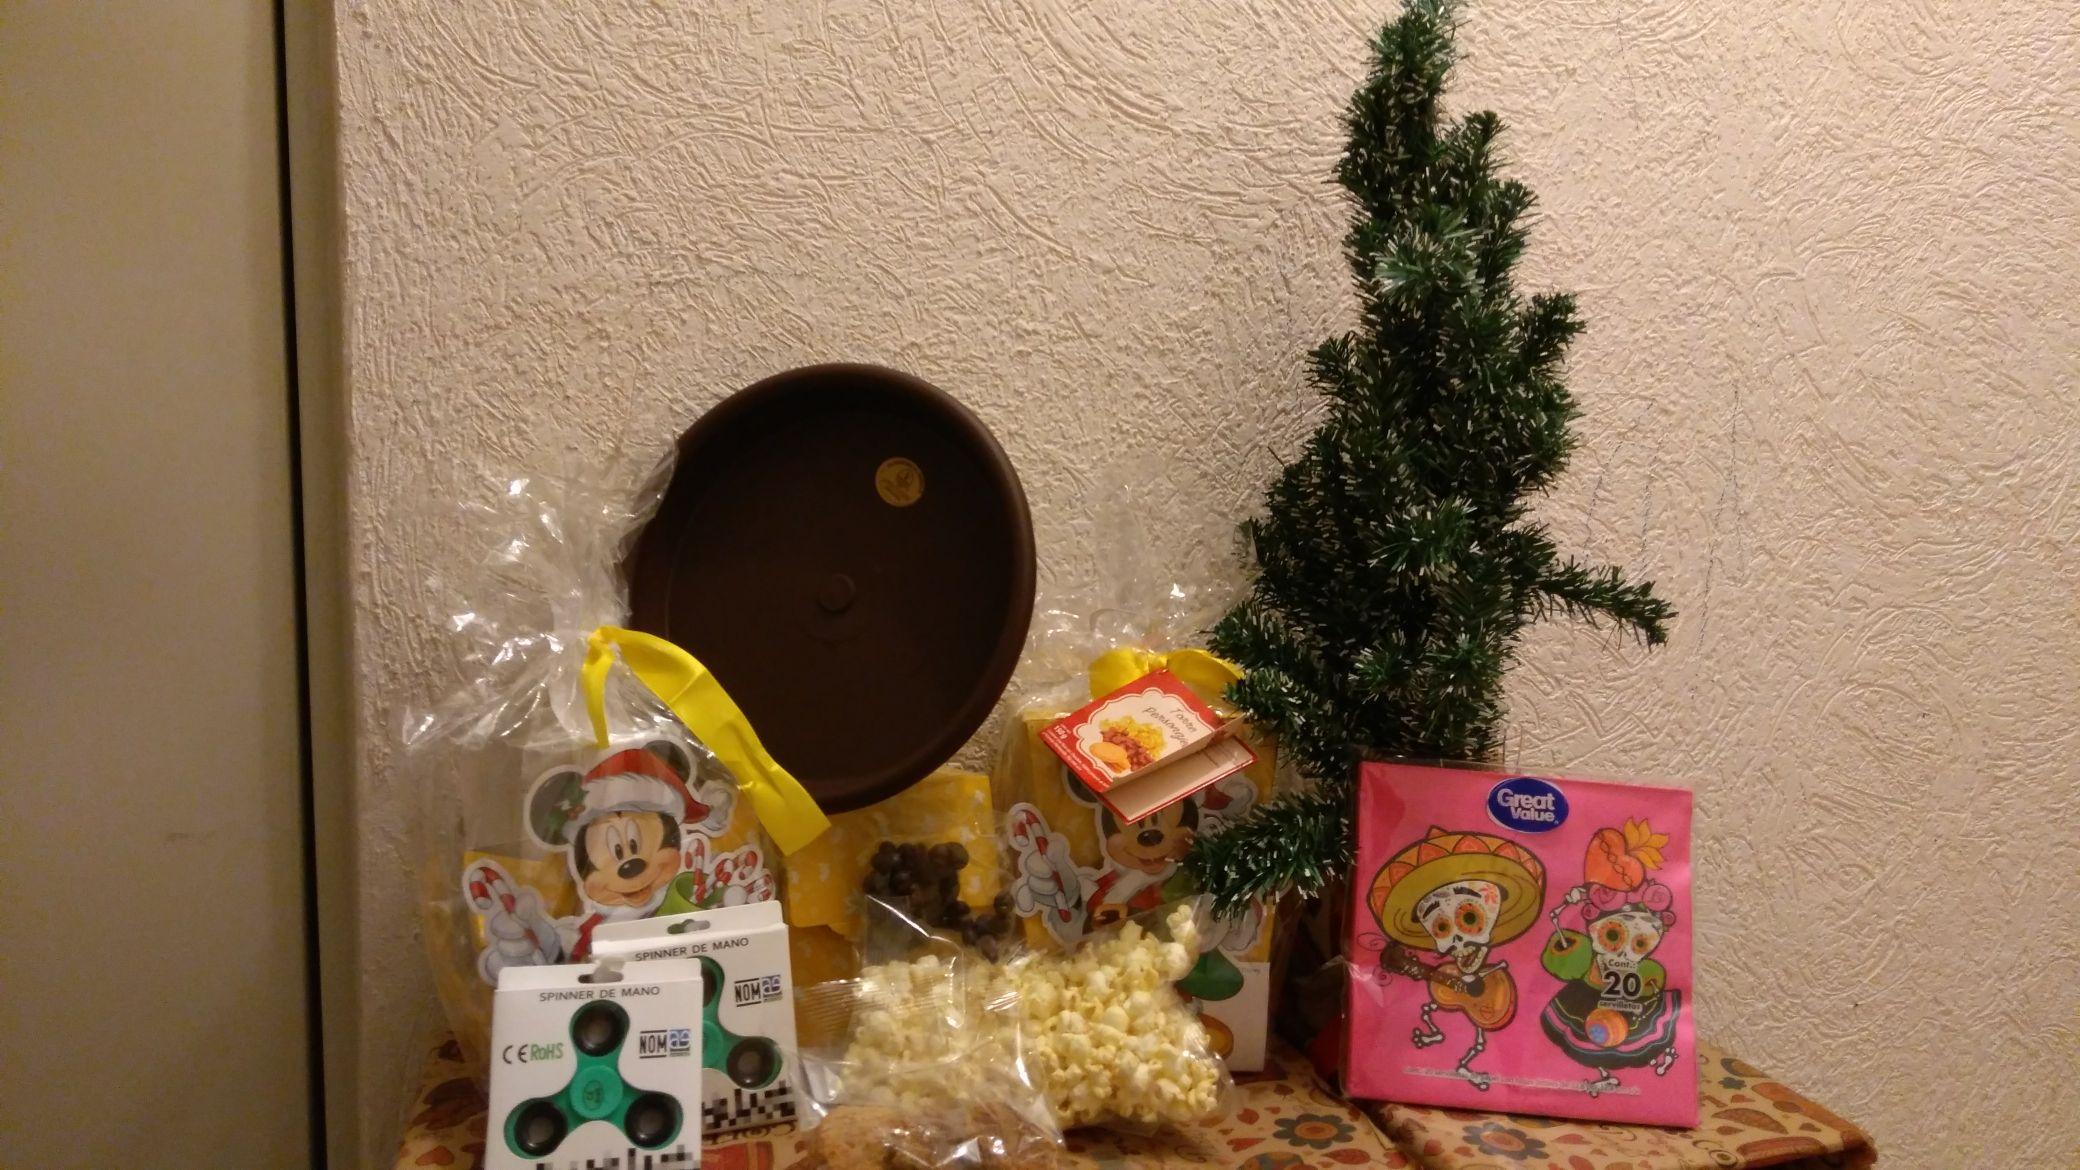 Walmart Torres Lindavista: Árbol de navidad 60 cm. ¢1 (unicornio), Torre Disney navideña, spinner, plato p/maceta, servilletas + Promonovela corta